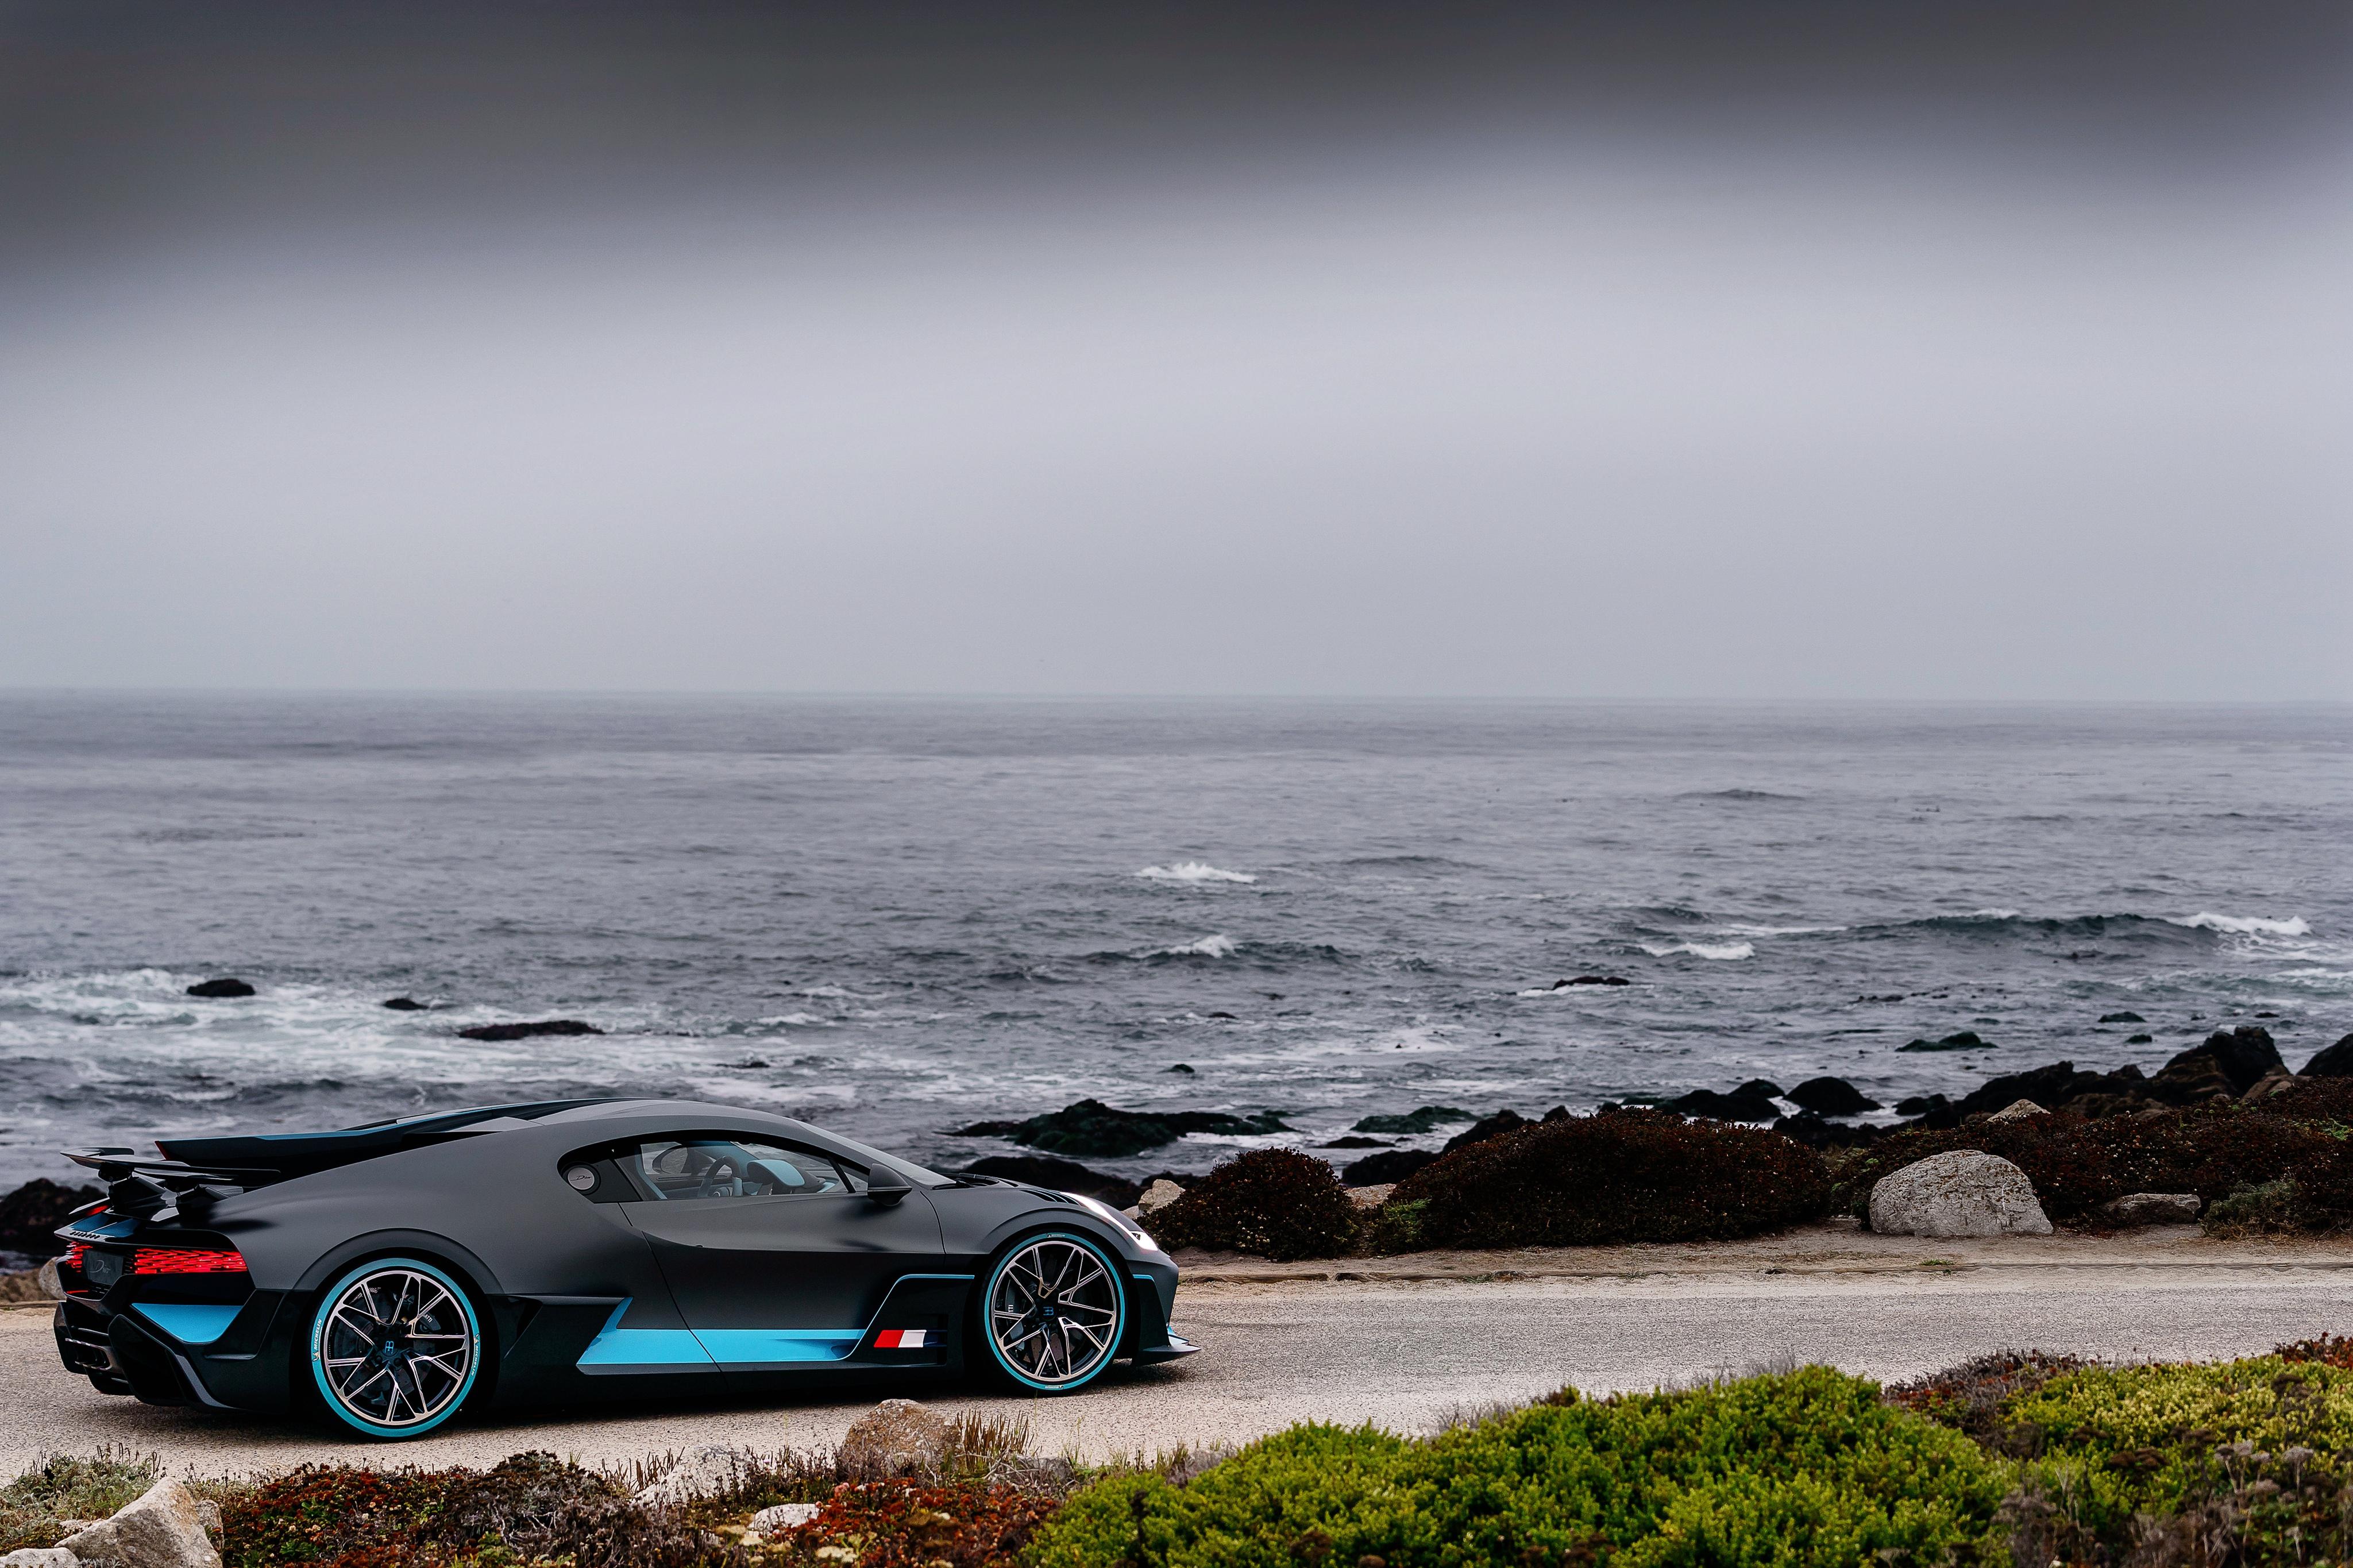 Bugatti Divo 4k Ultra Hd Wallpaper Background Image 4096x2730